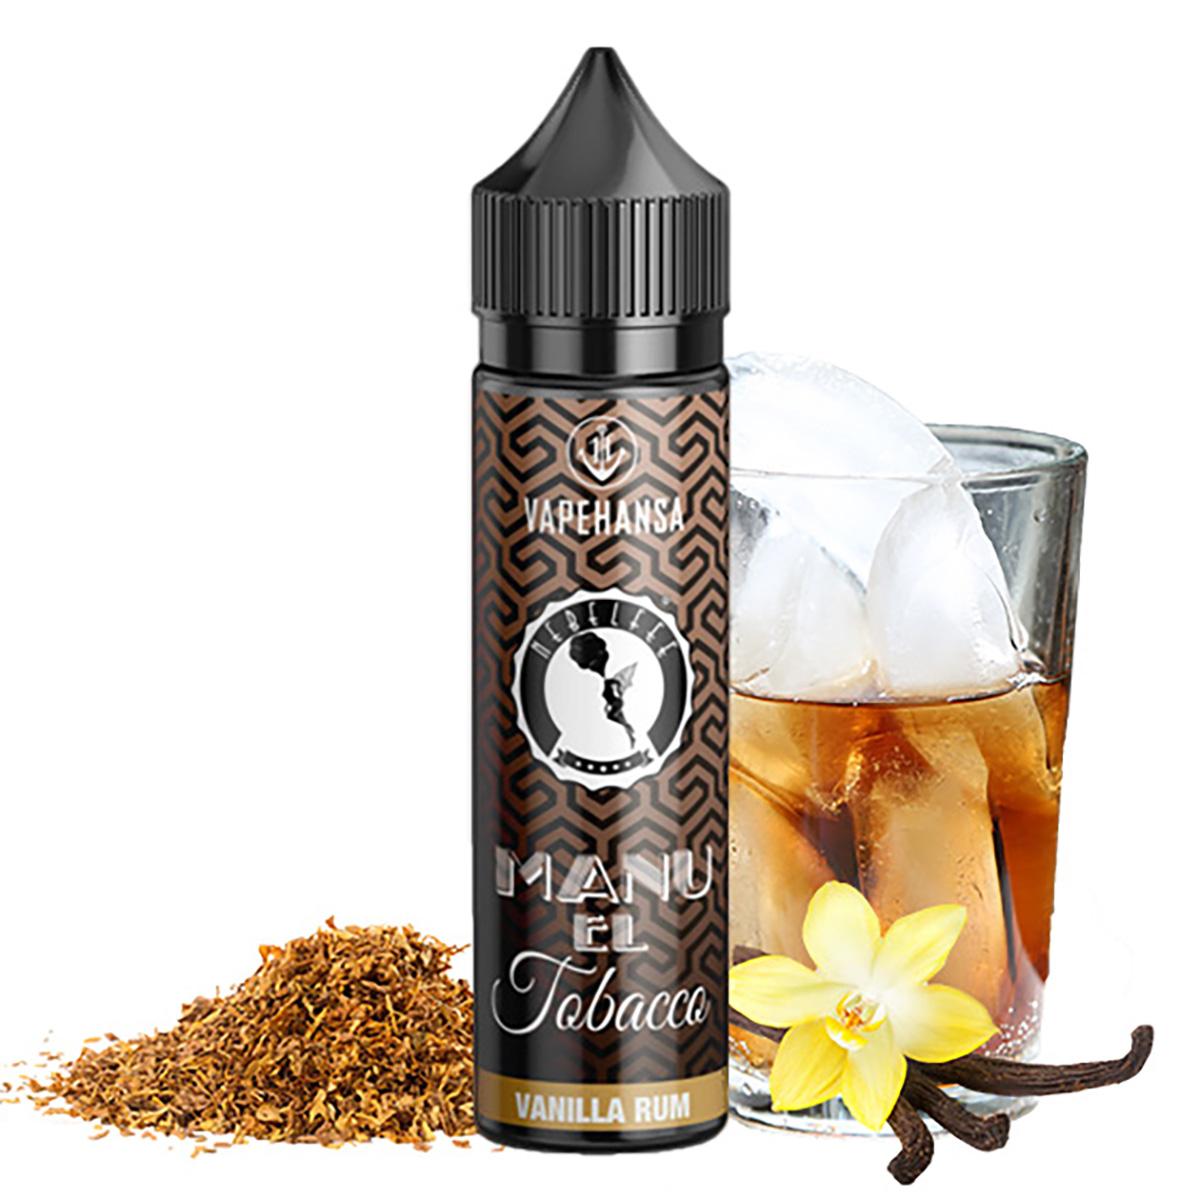 NEBELFEE Manu EL Tobacco Vanilla Custard Rum Aroma 10ml Longfill